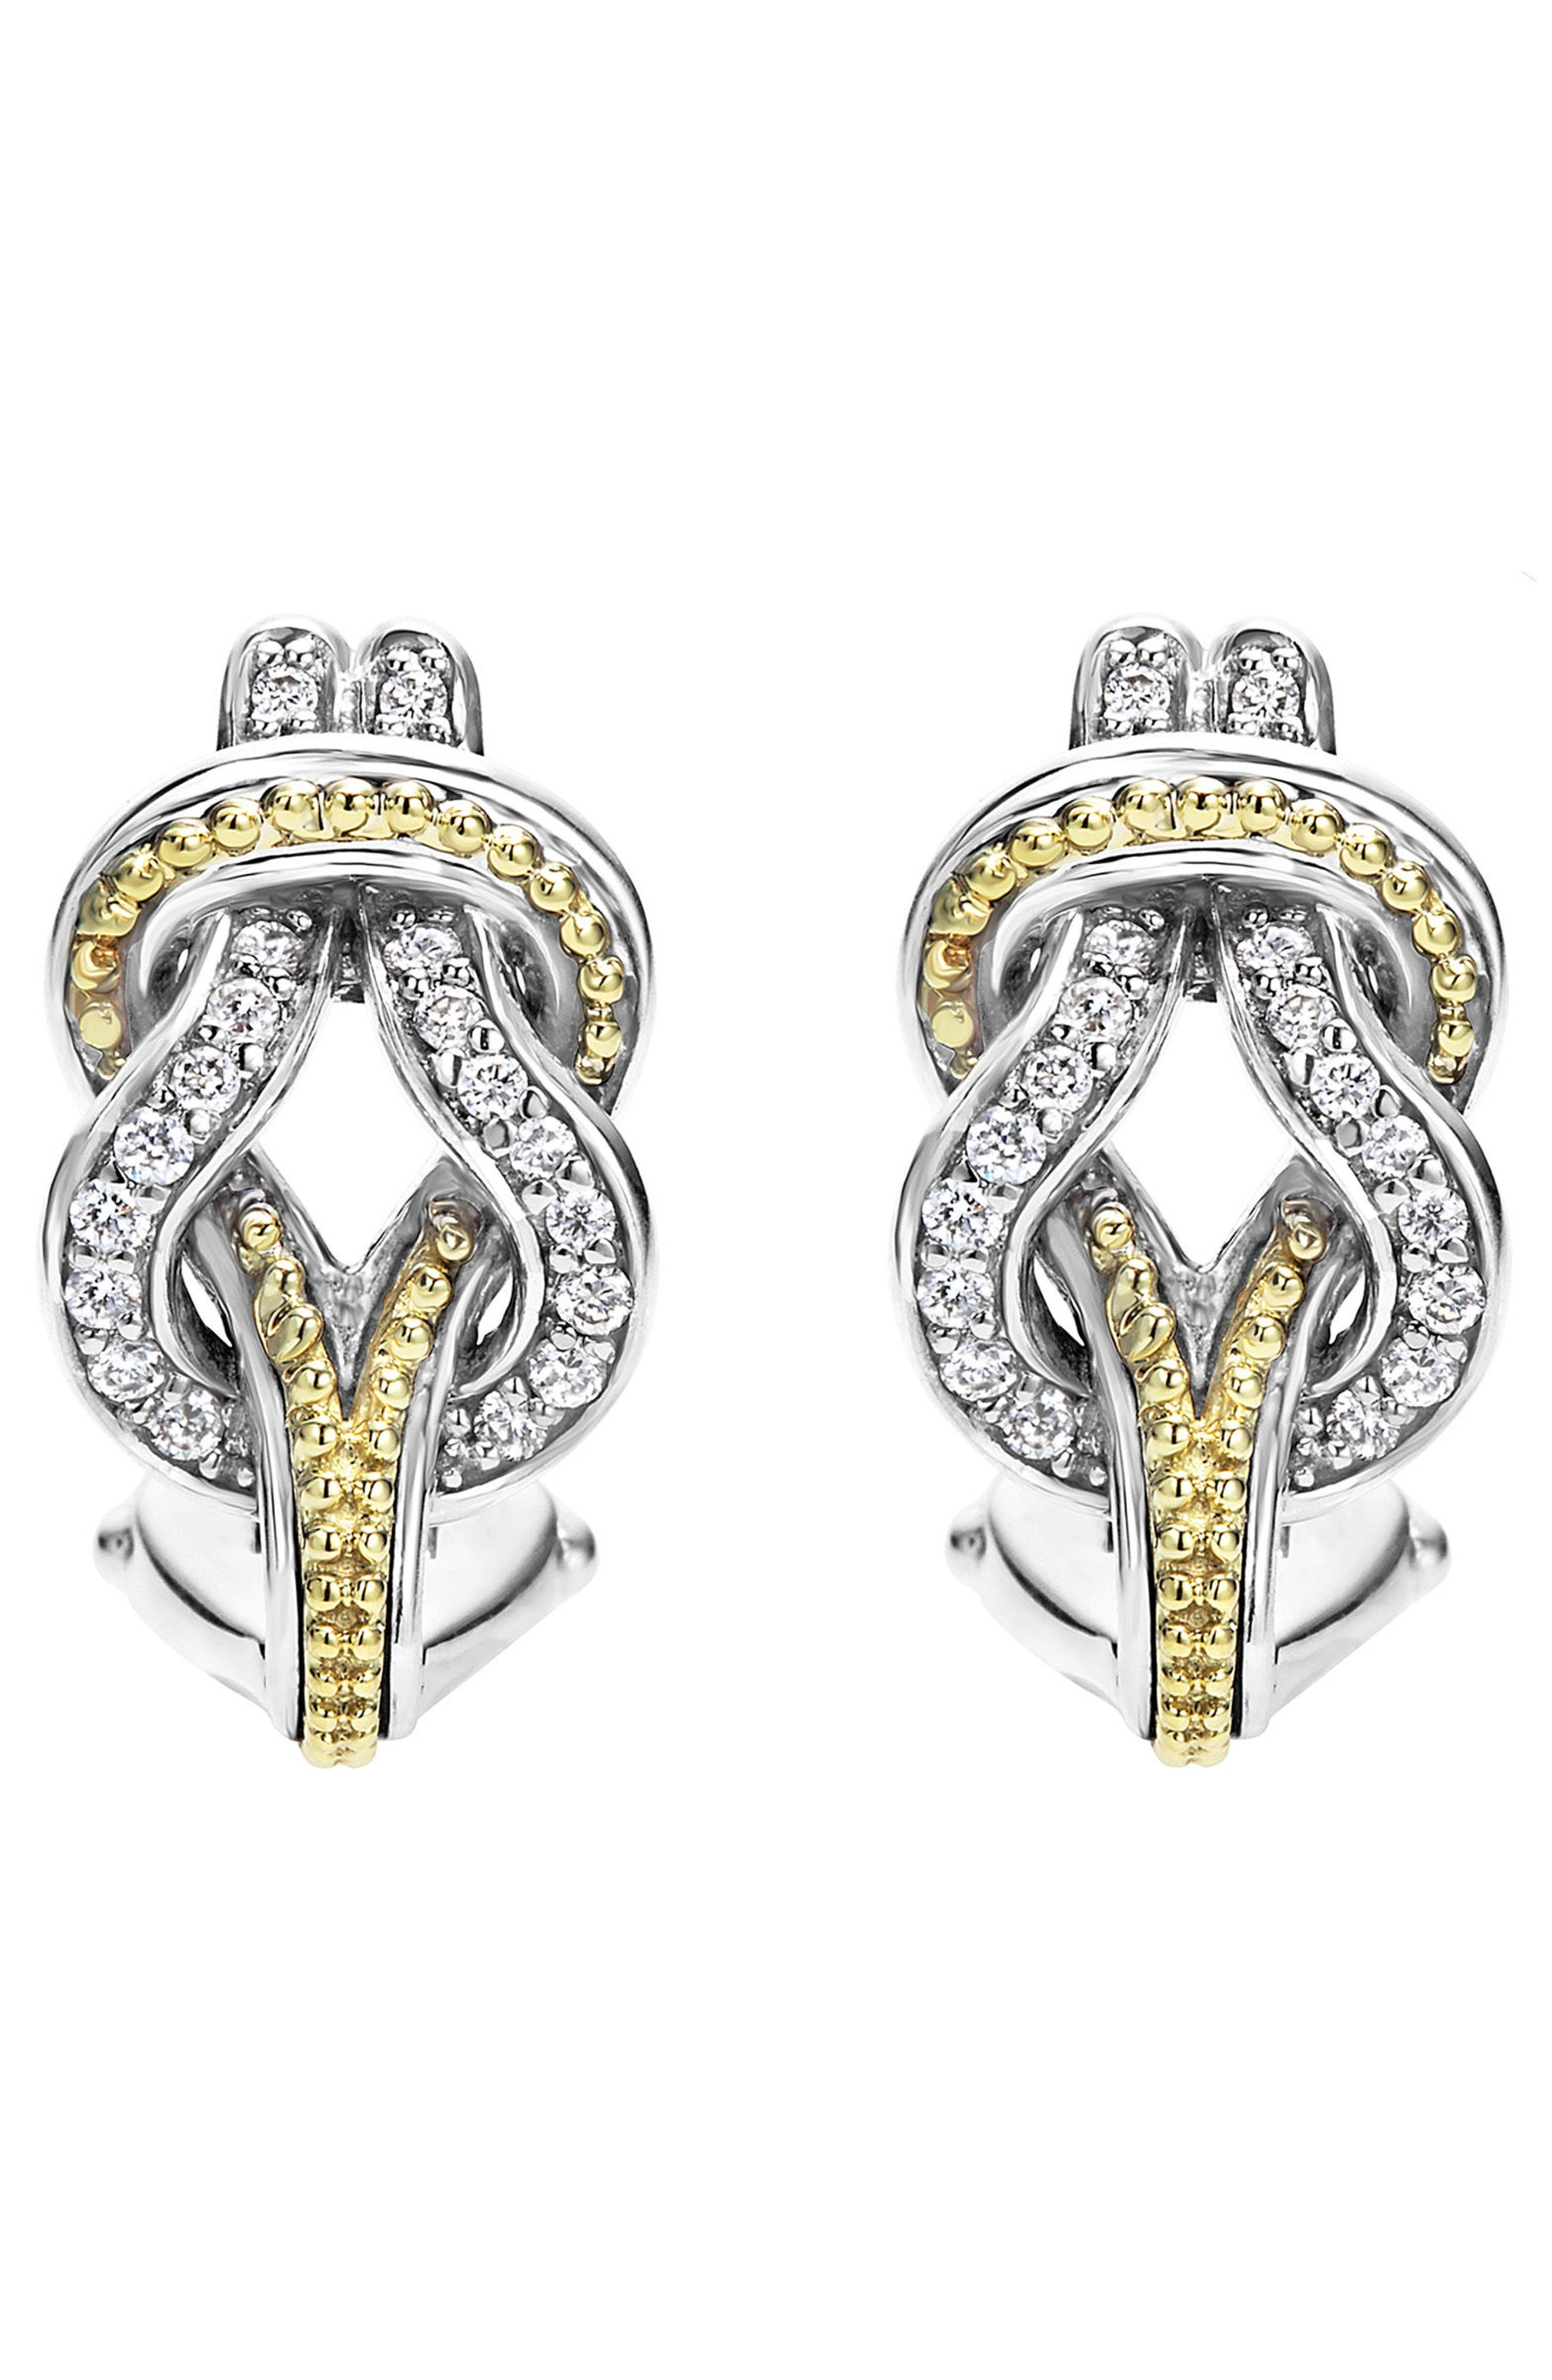 'Newport' Diamond Knot Earrings,                             Alternate thumbnail 3, color,                             SILVER/ GOLD